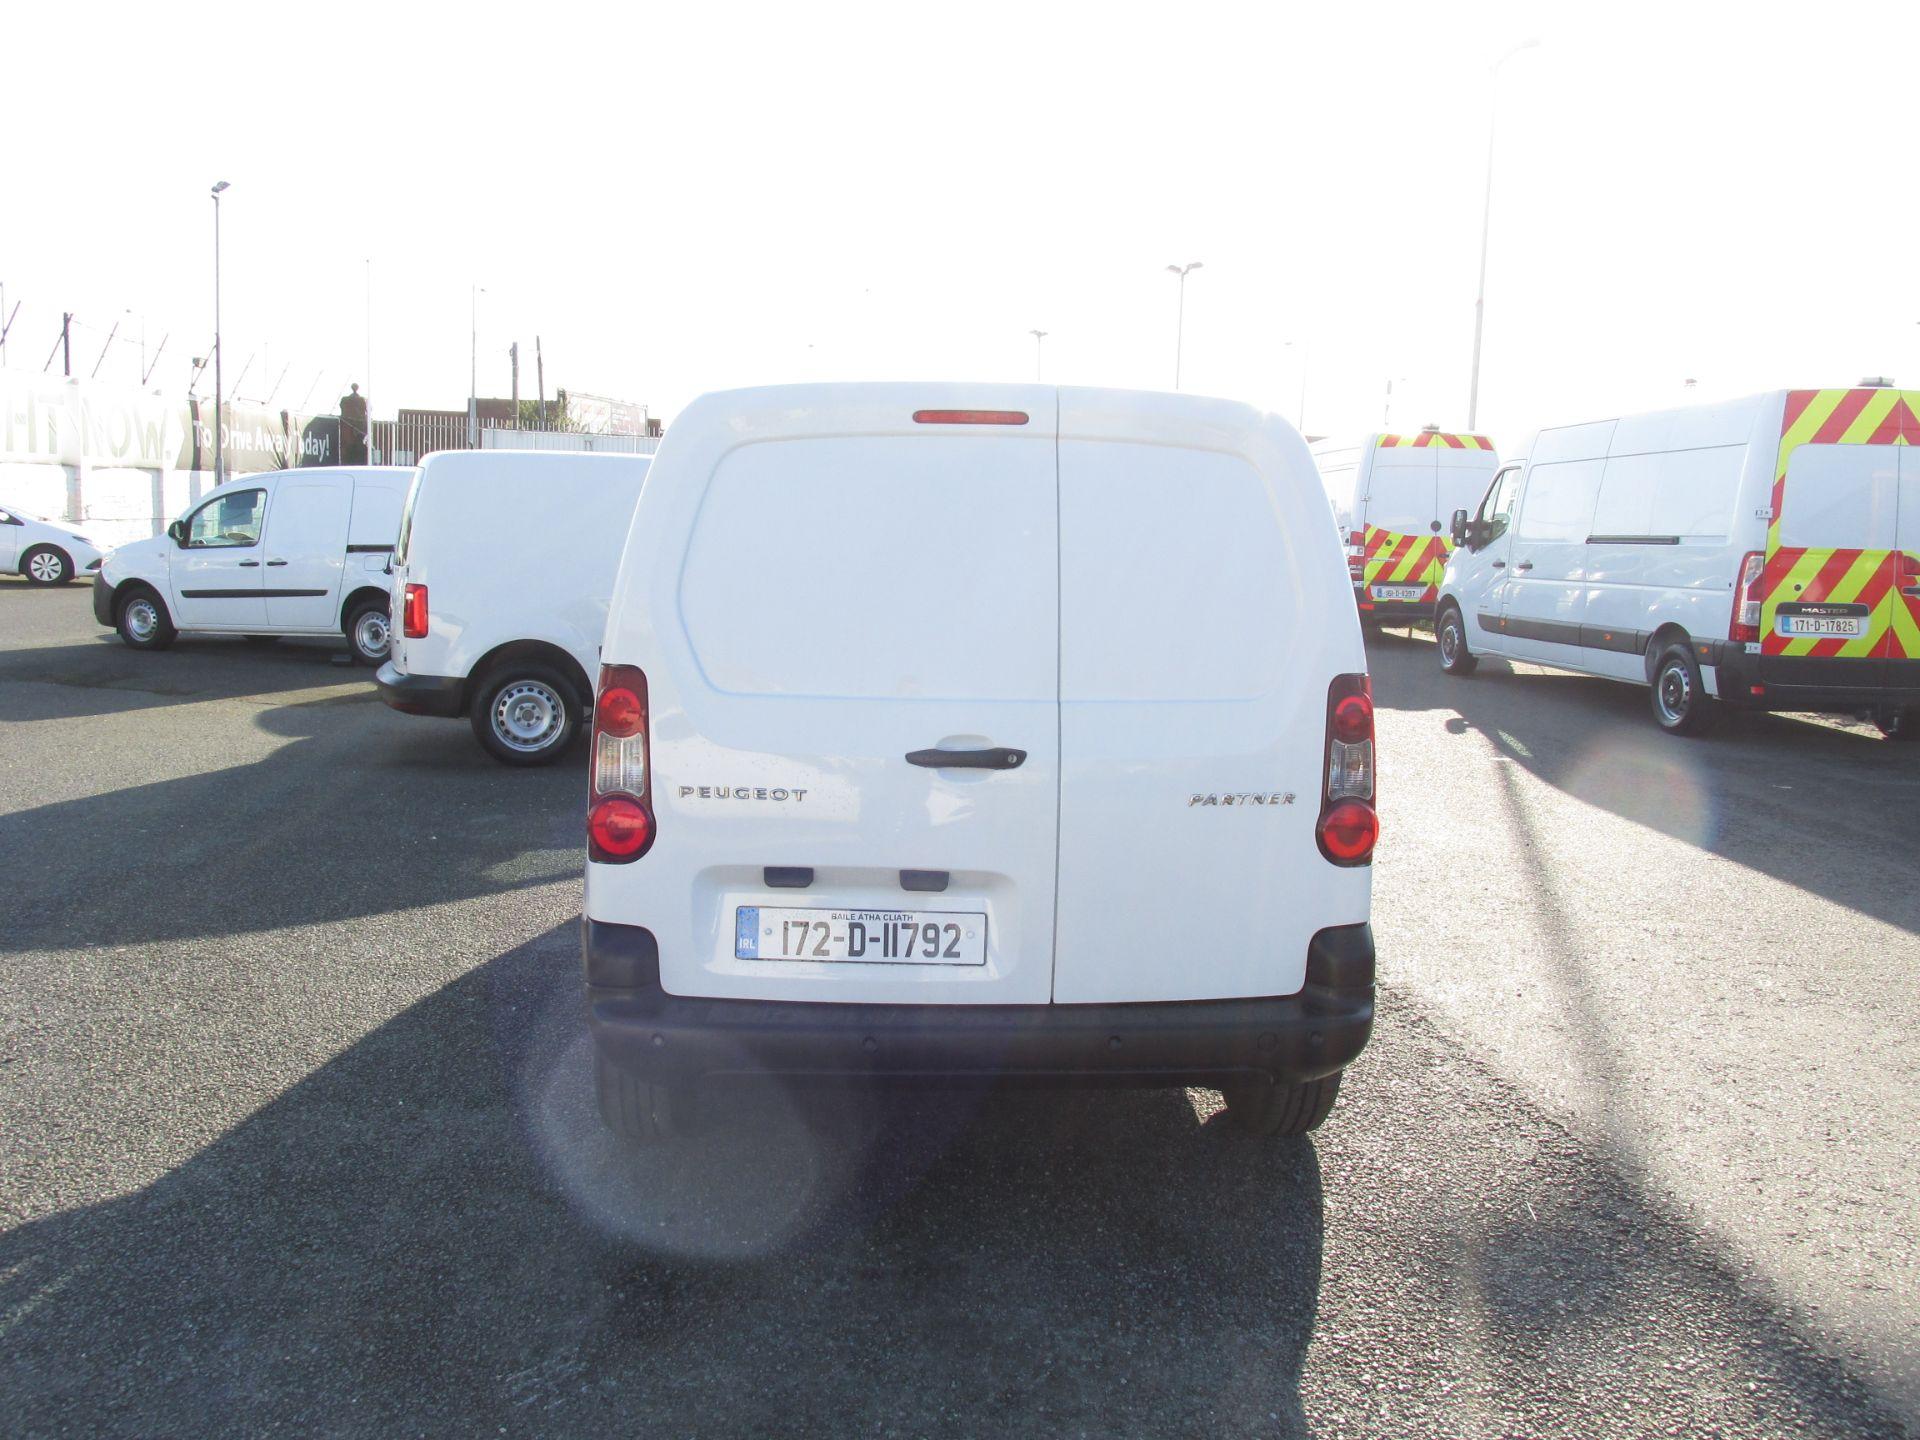 2017 Peugeot Partner 3 SEATER (172D11792) Image 6